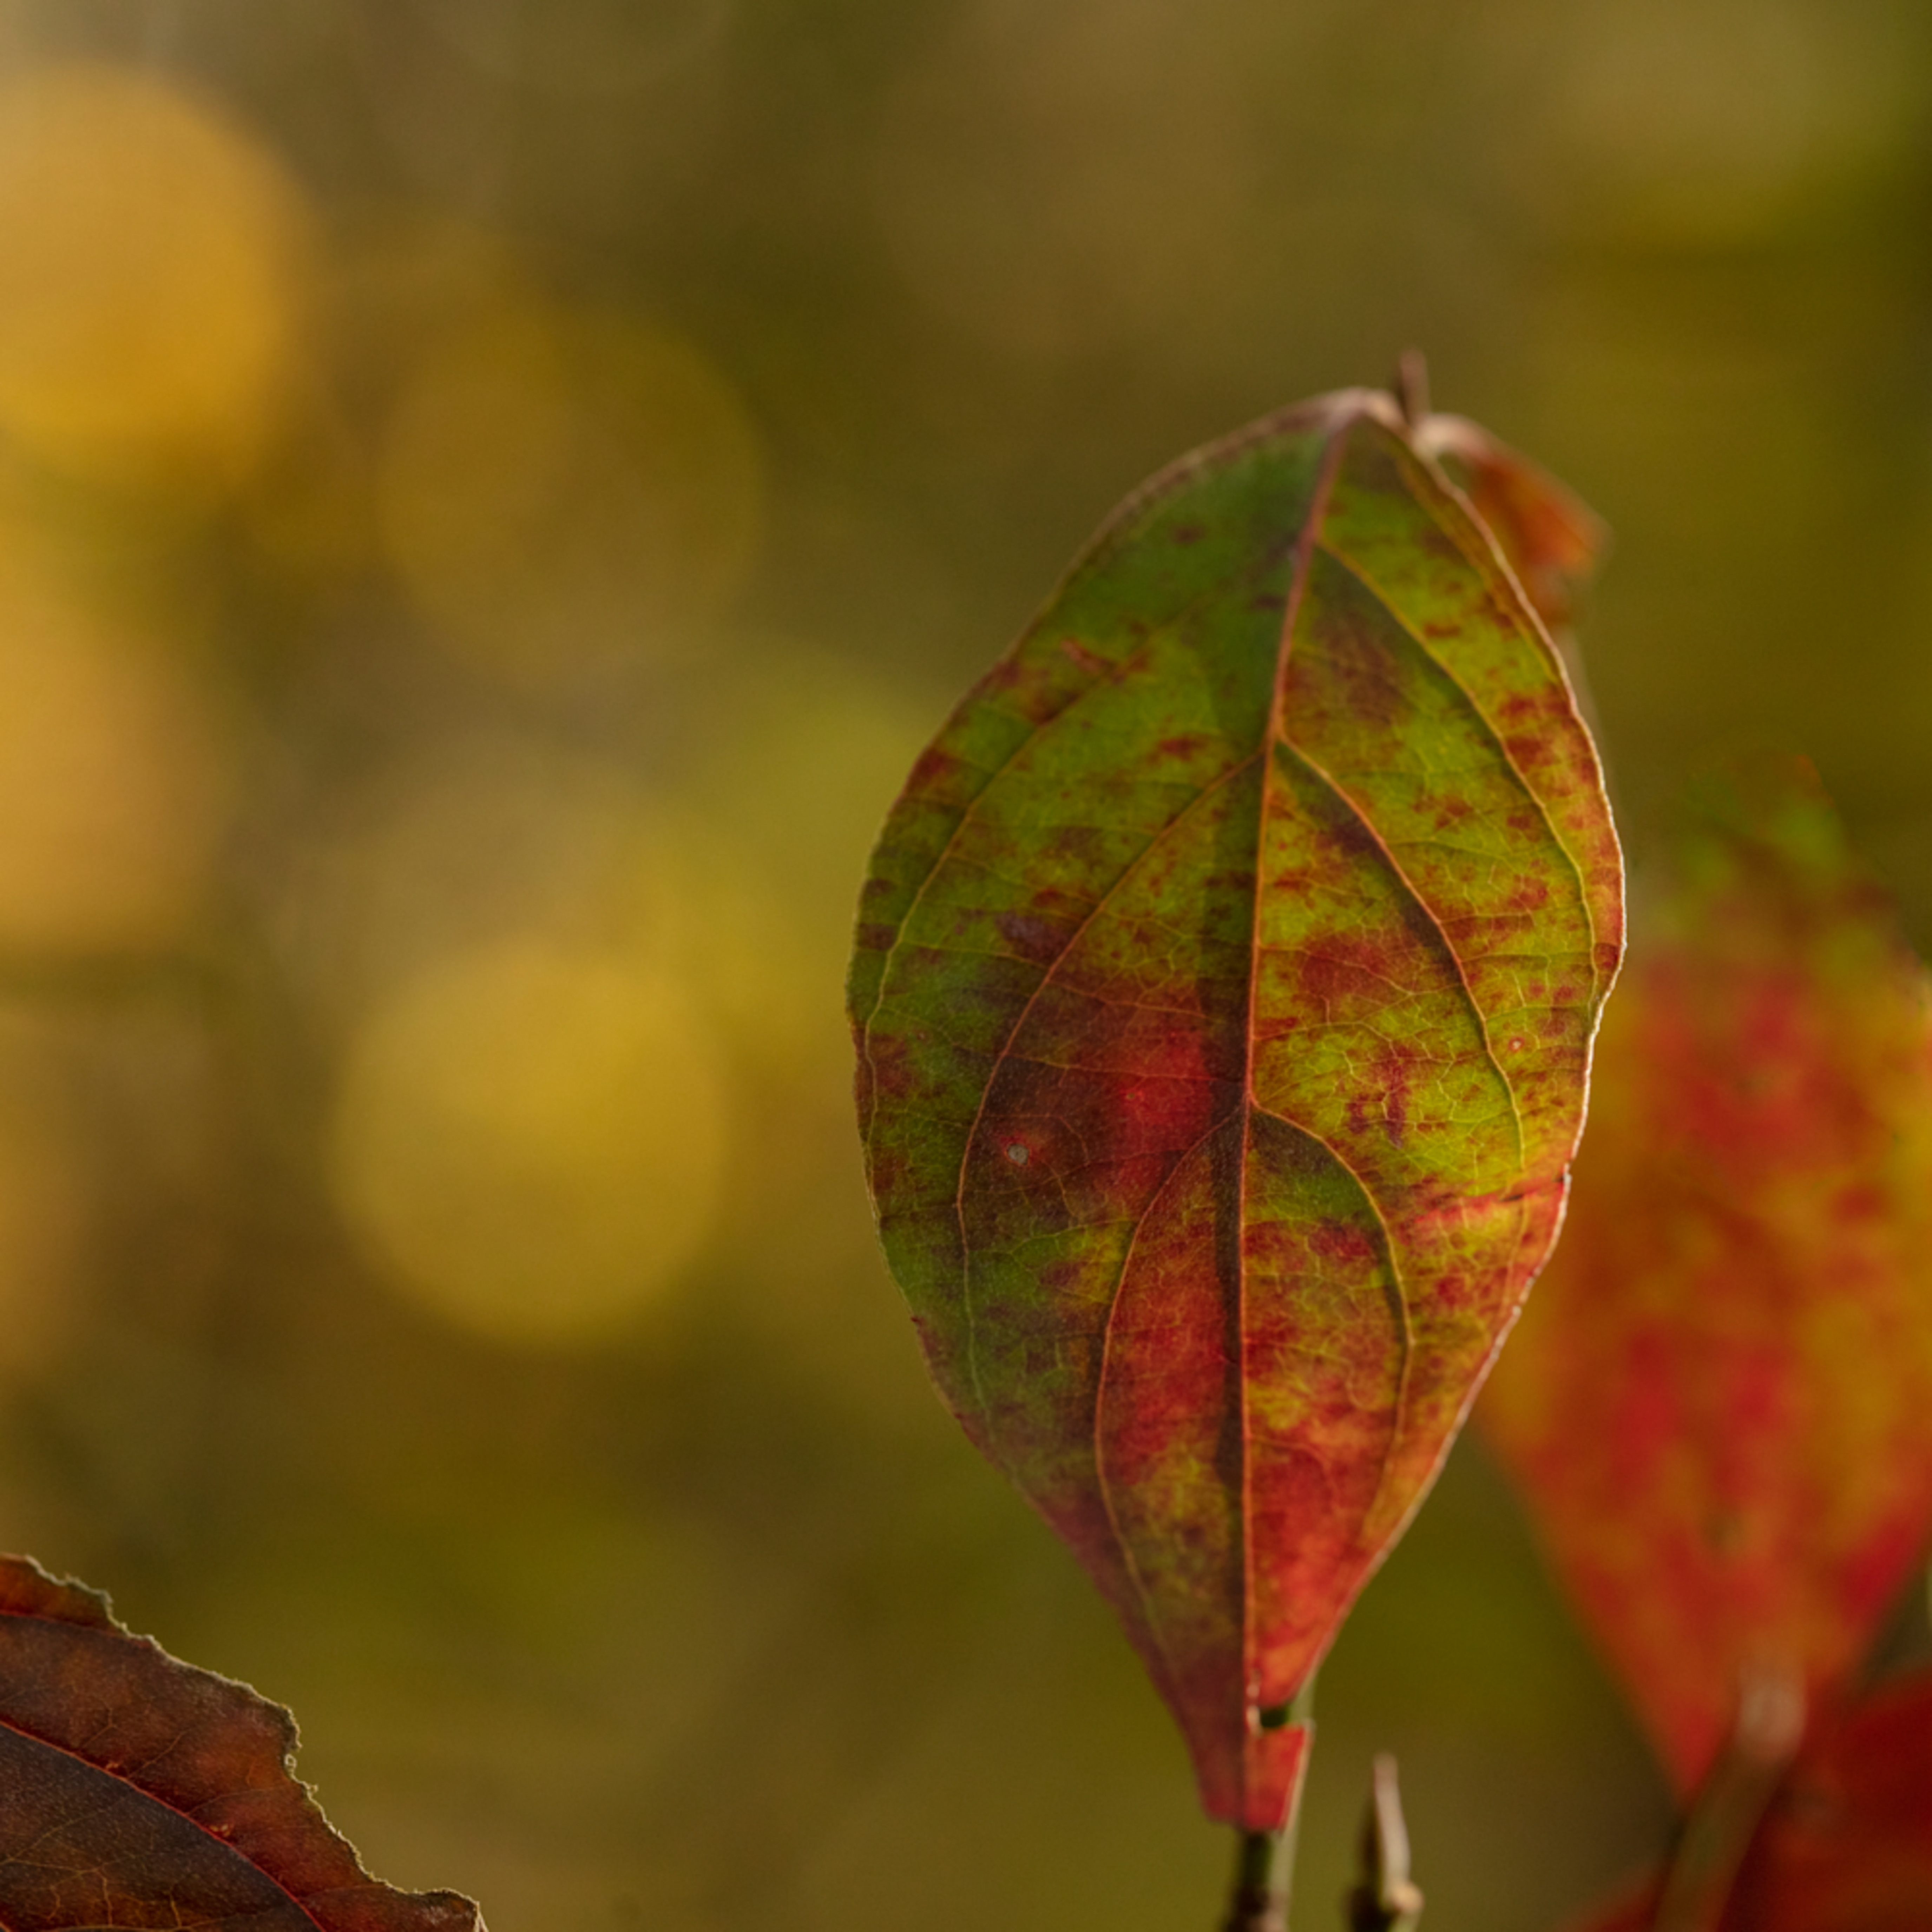 Dogwood leaf 0705fss healthcare art neu0k9